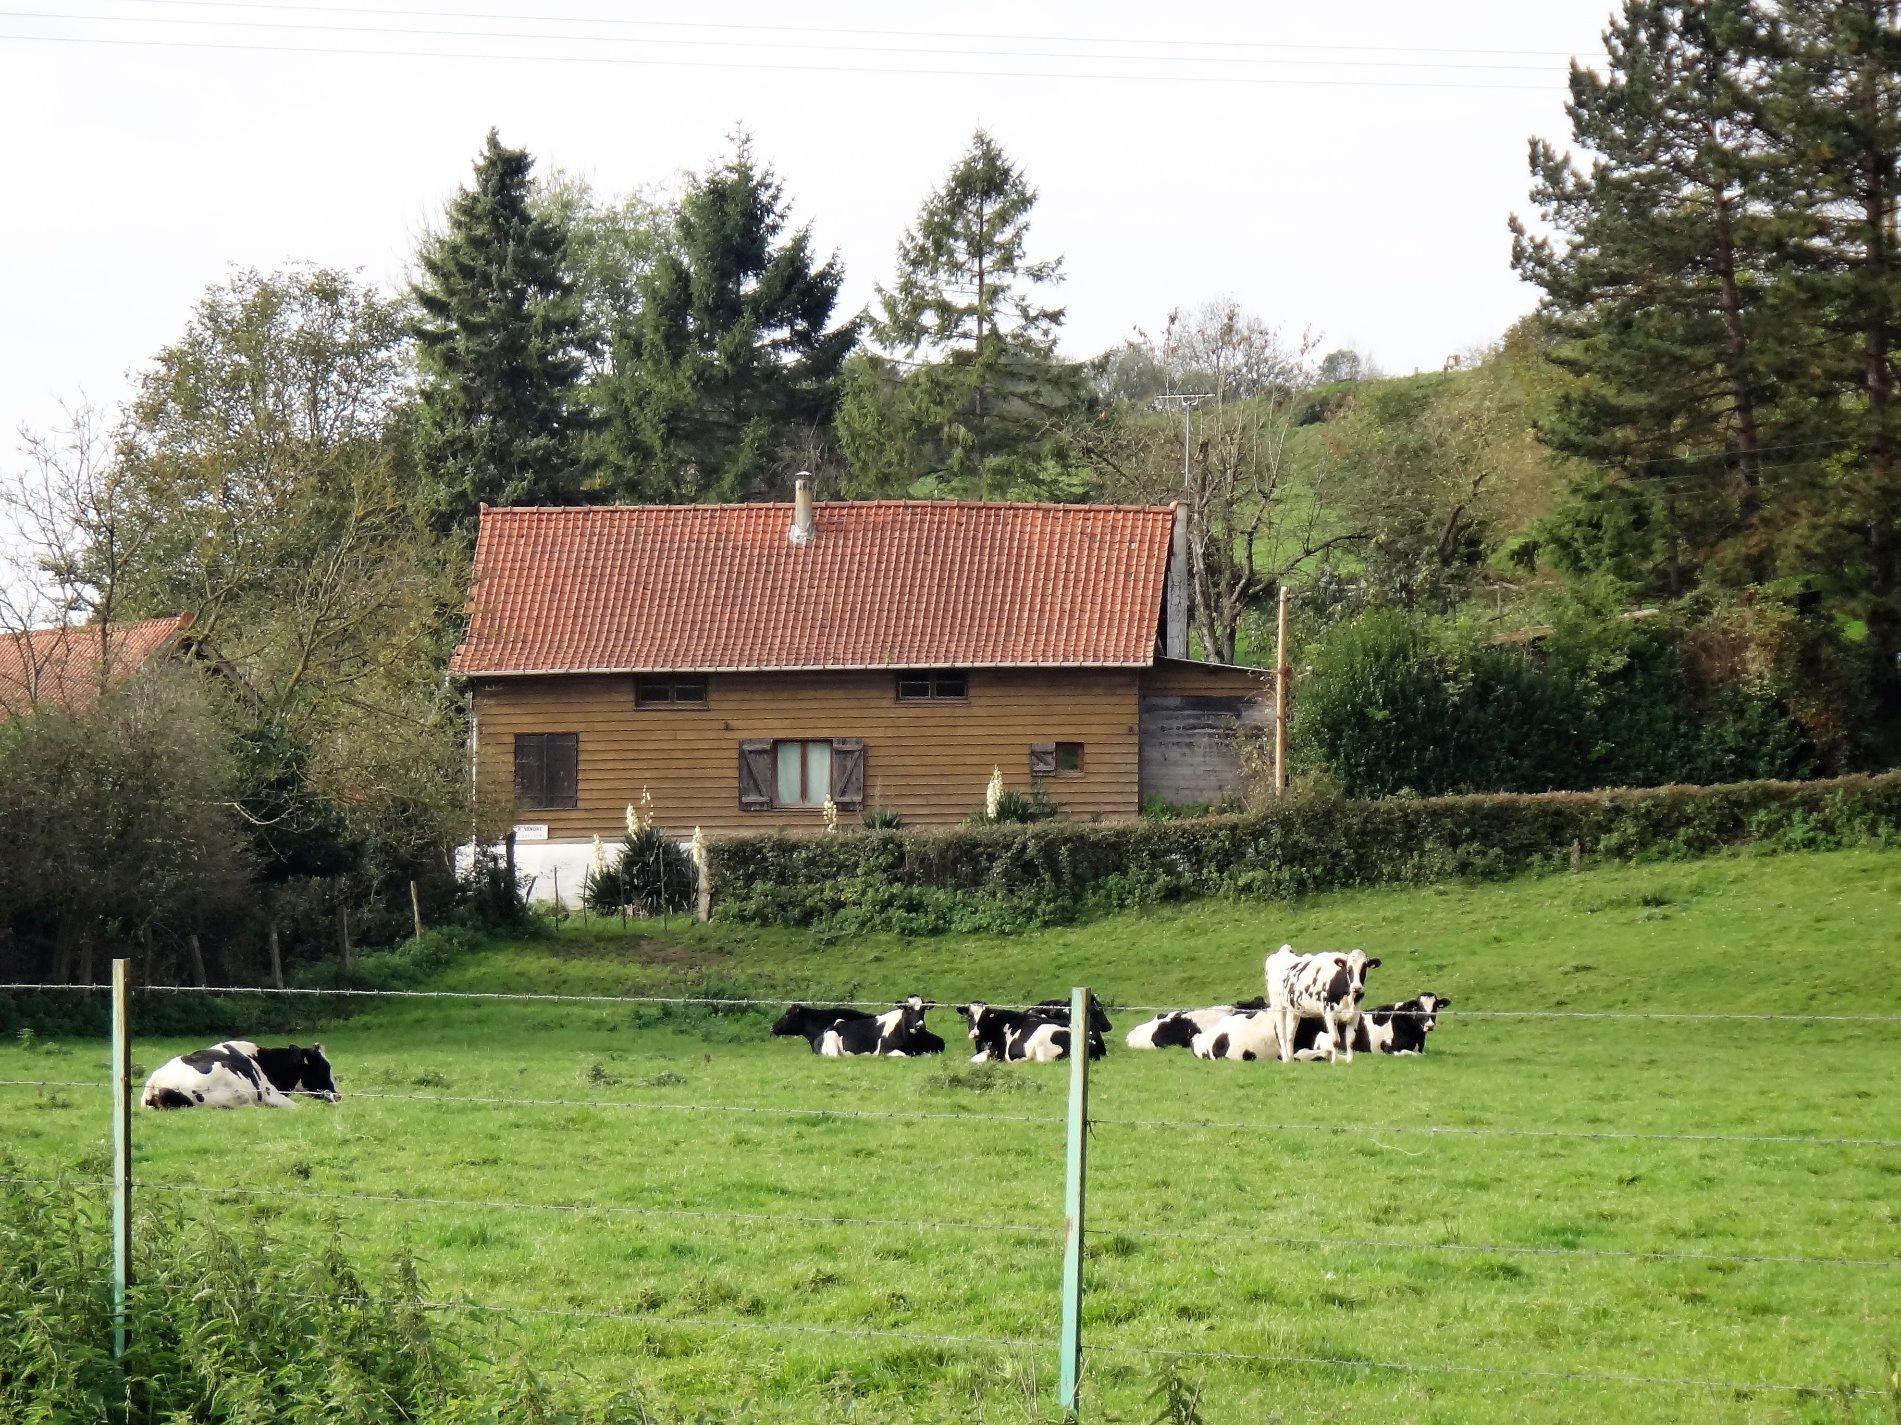 vente belle grange am nag e situ e dans un hameau proche d 39 hesdin. Black Bedroom Furniture Sets. Home Design Ideas